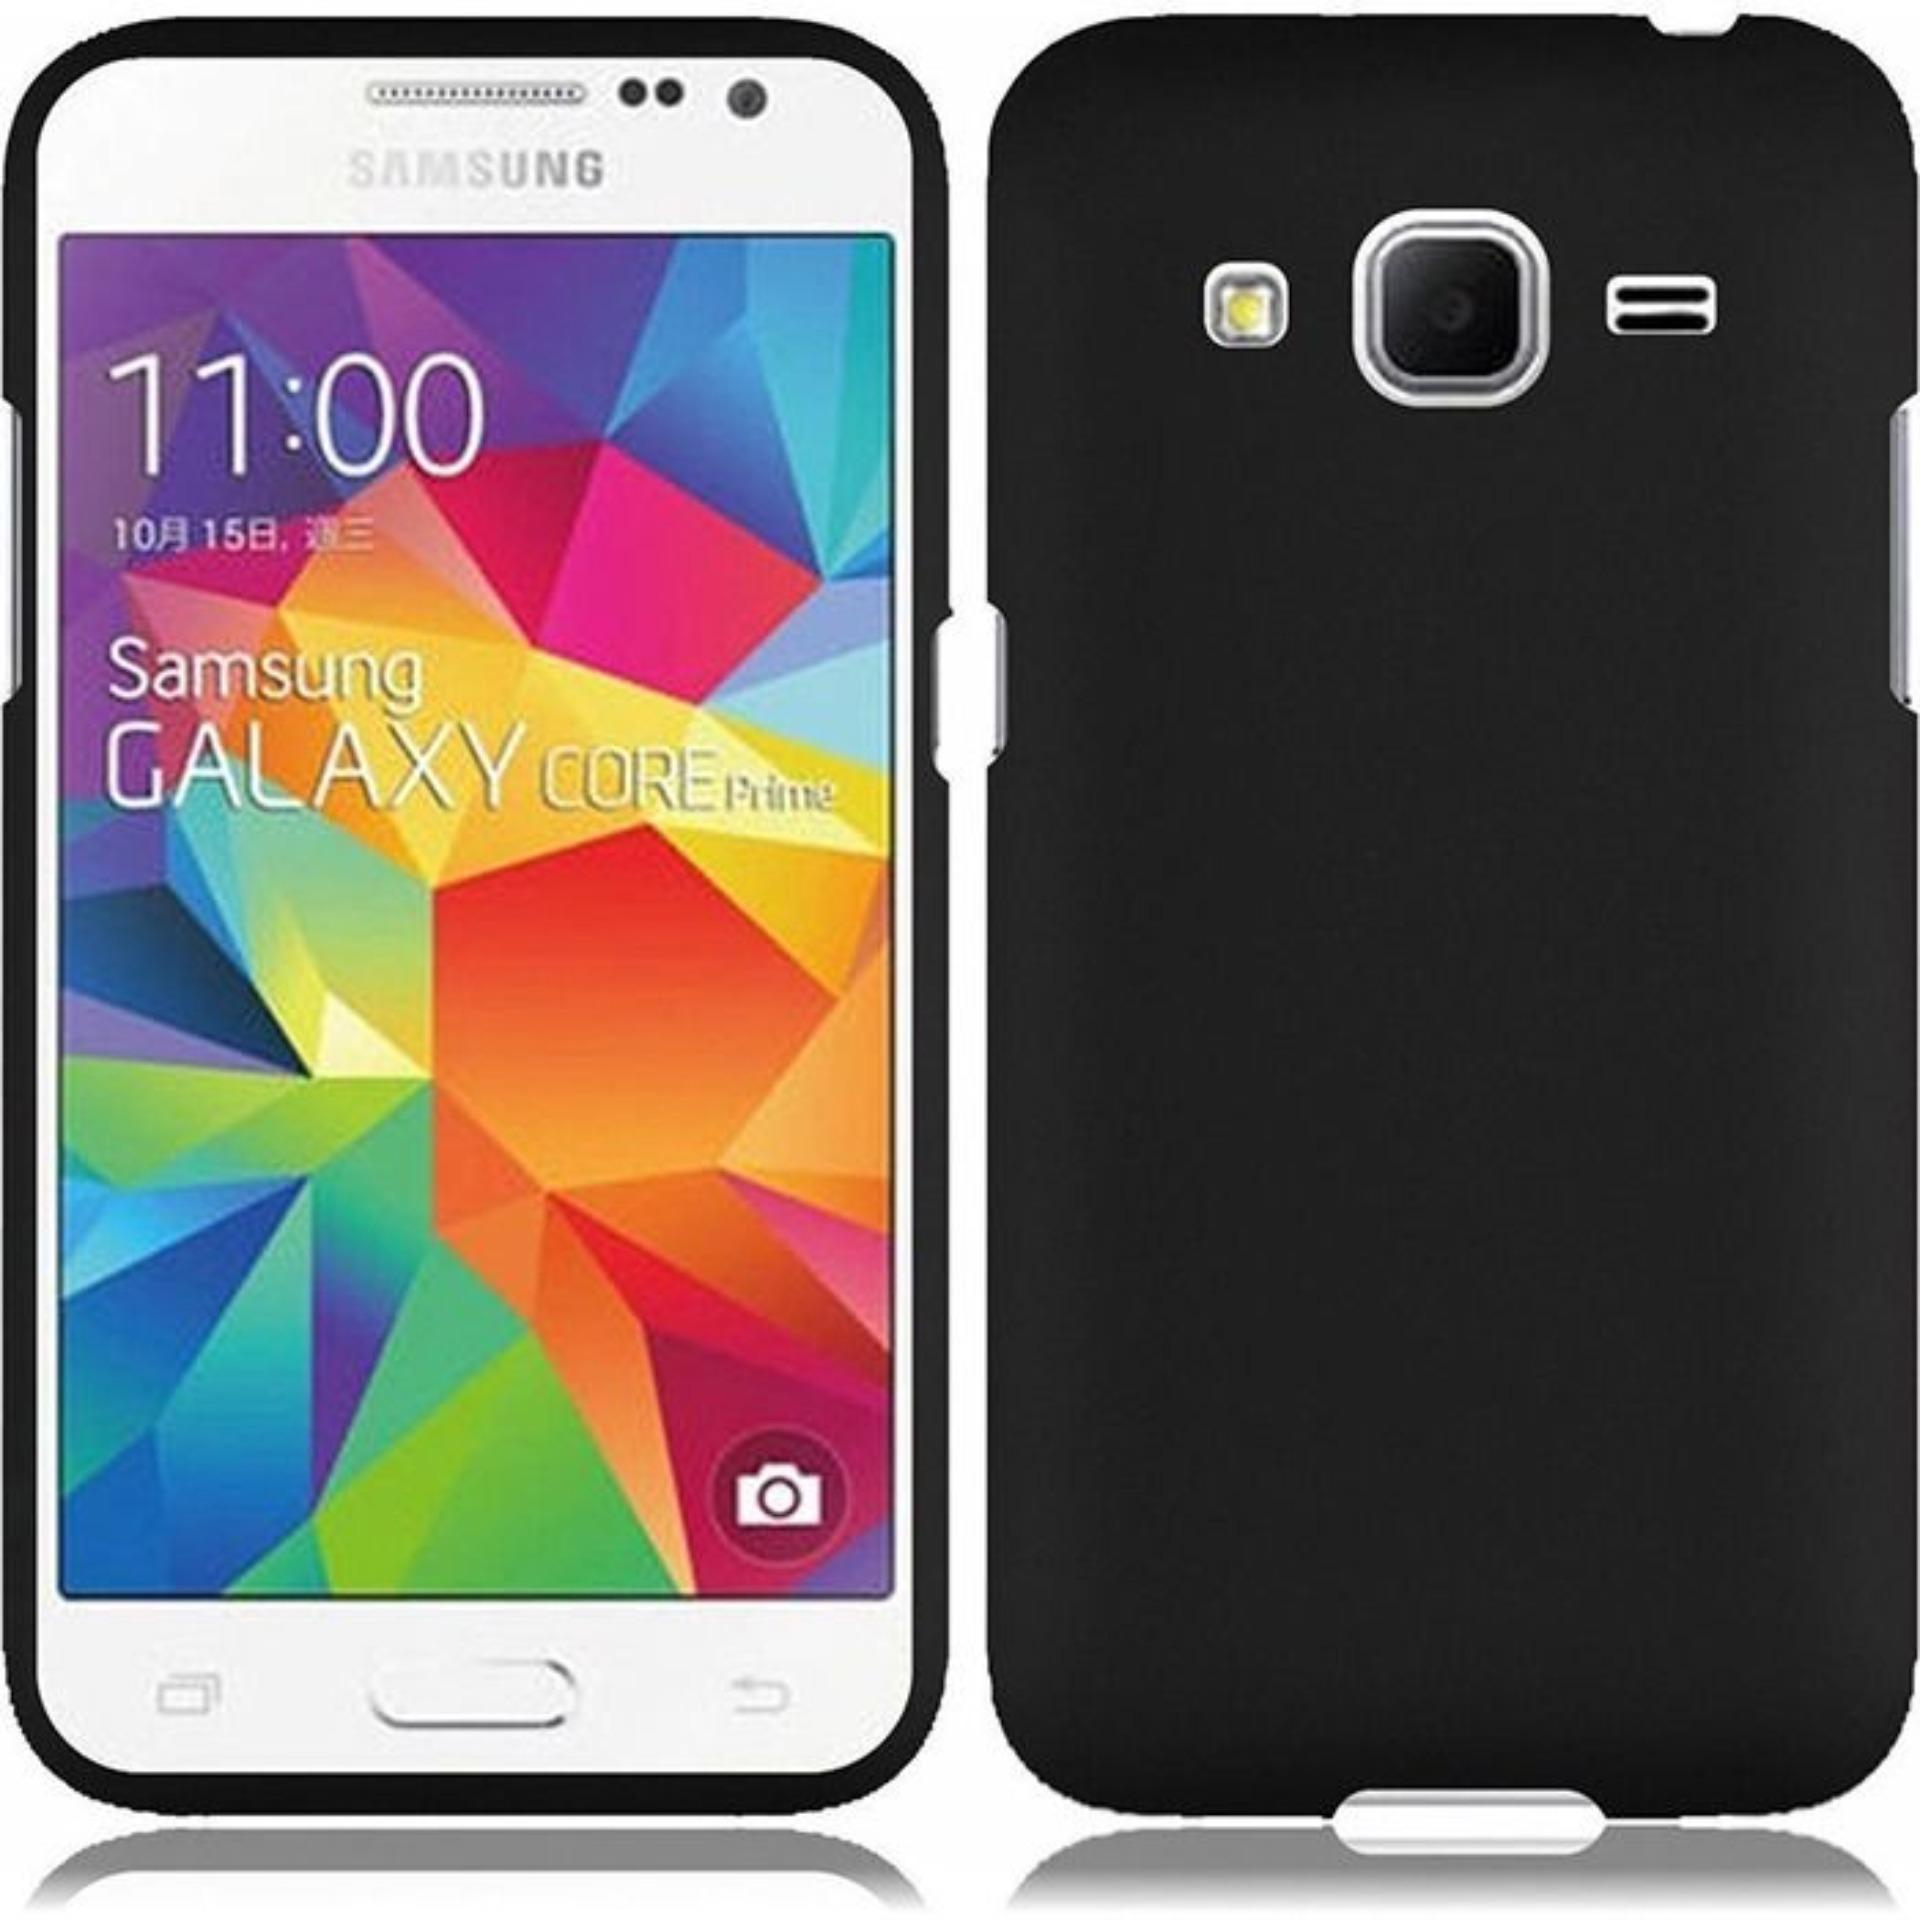 DarkNight for Samsung Galaxy Core 2 / G355 / G355H / 4G LTE / Duos | Slim Case Black Matte Softcase Premium (Anti Minyak/Anti Sidik Jari) - Hitam Doff